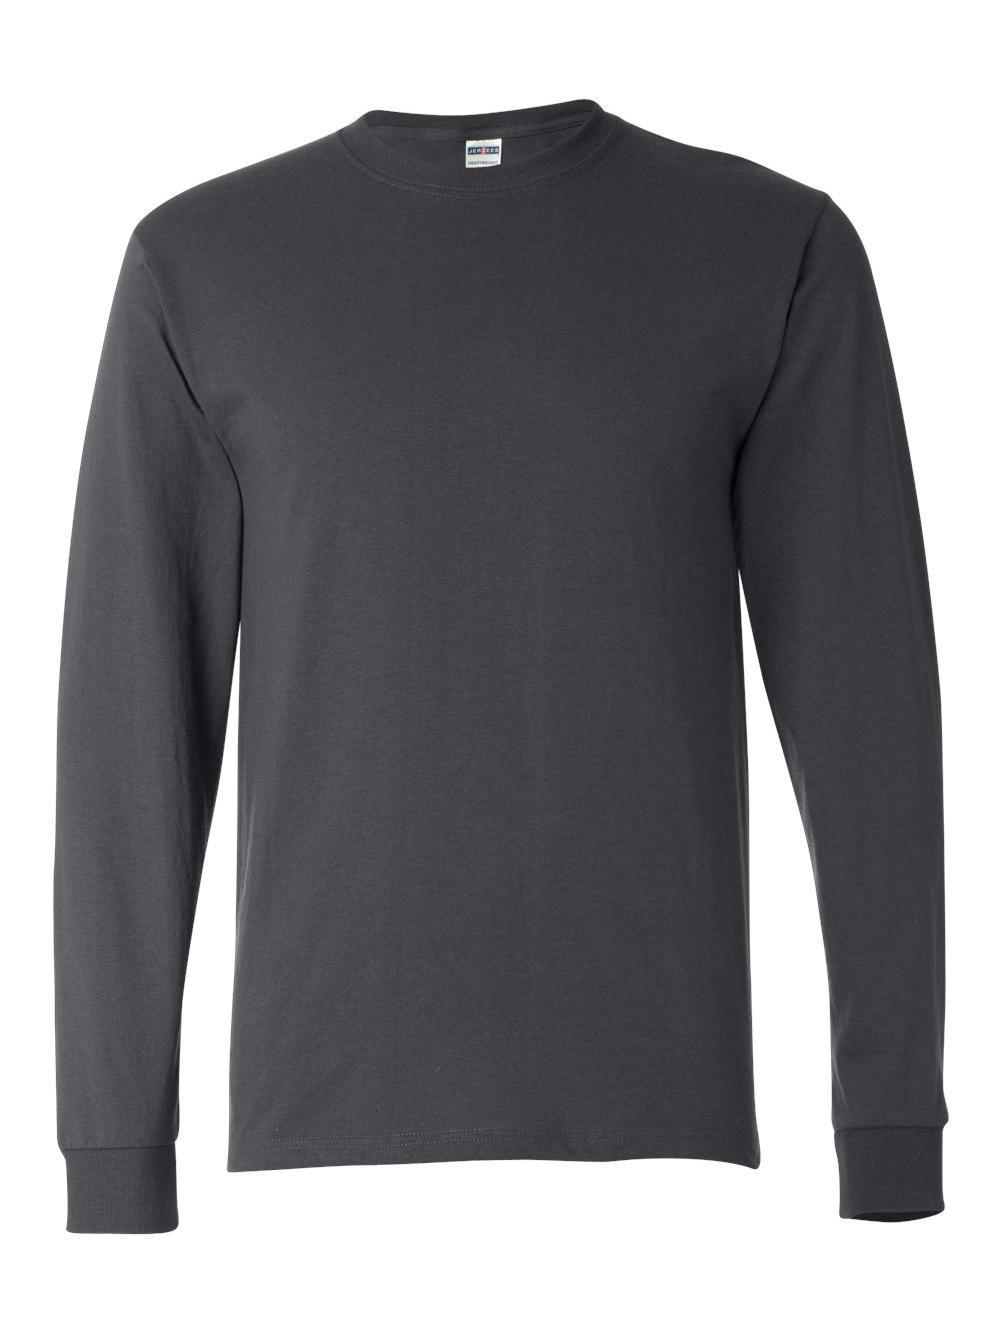 Jerzees-Dri-Power-Long-Sleeve-50-50-T-Shirt-29LSR thumbnail 24